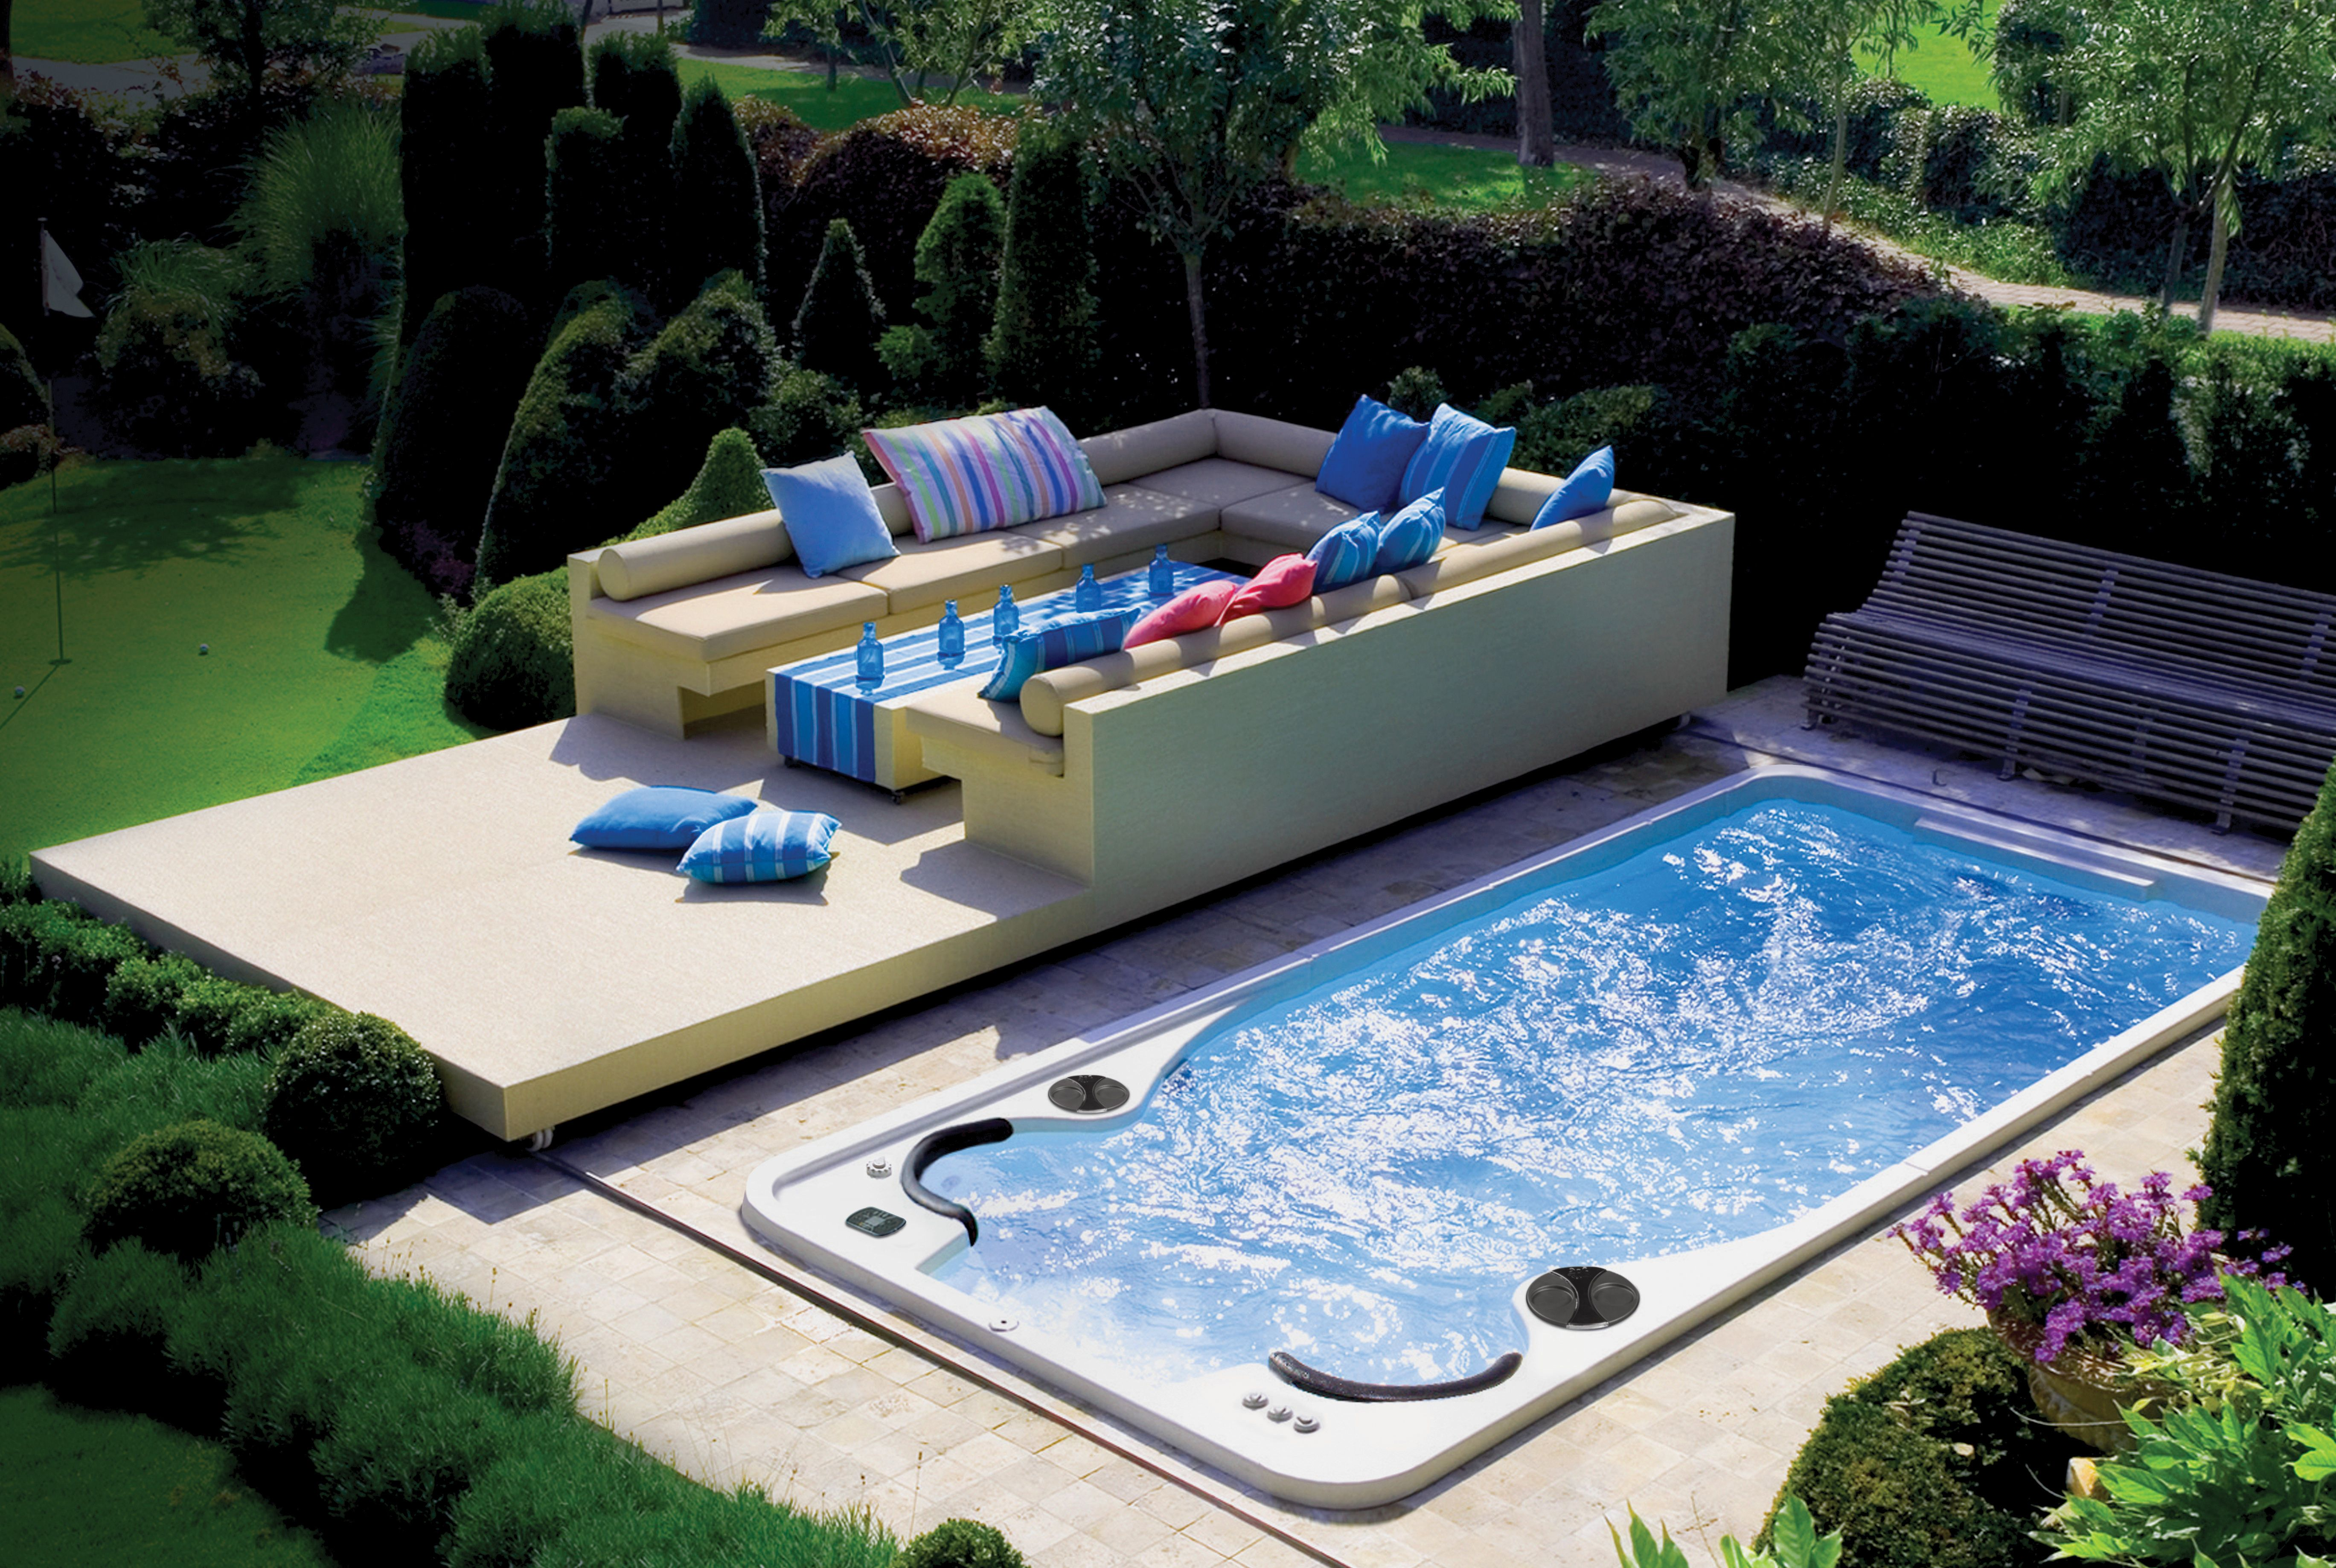 Like all Hydropool swim spas, the 17fX AquaSport can be ...